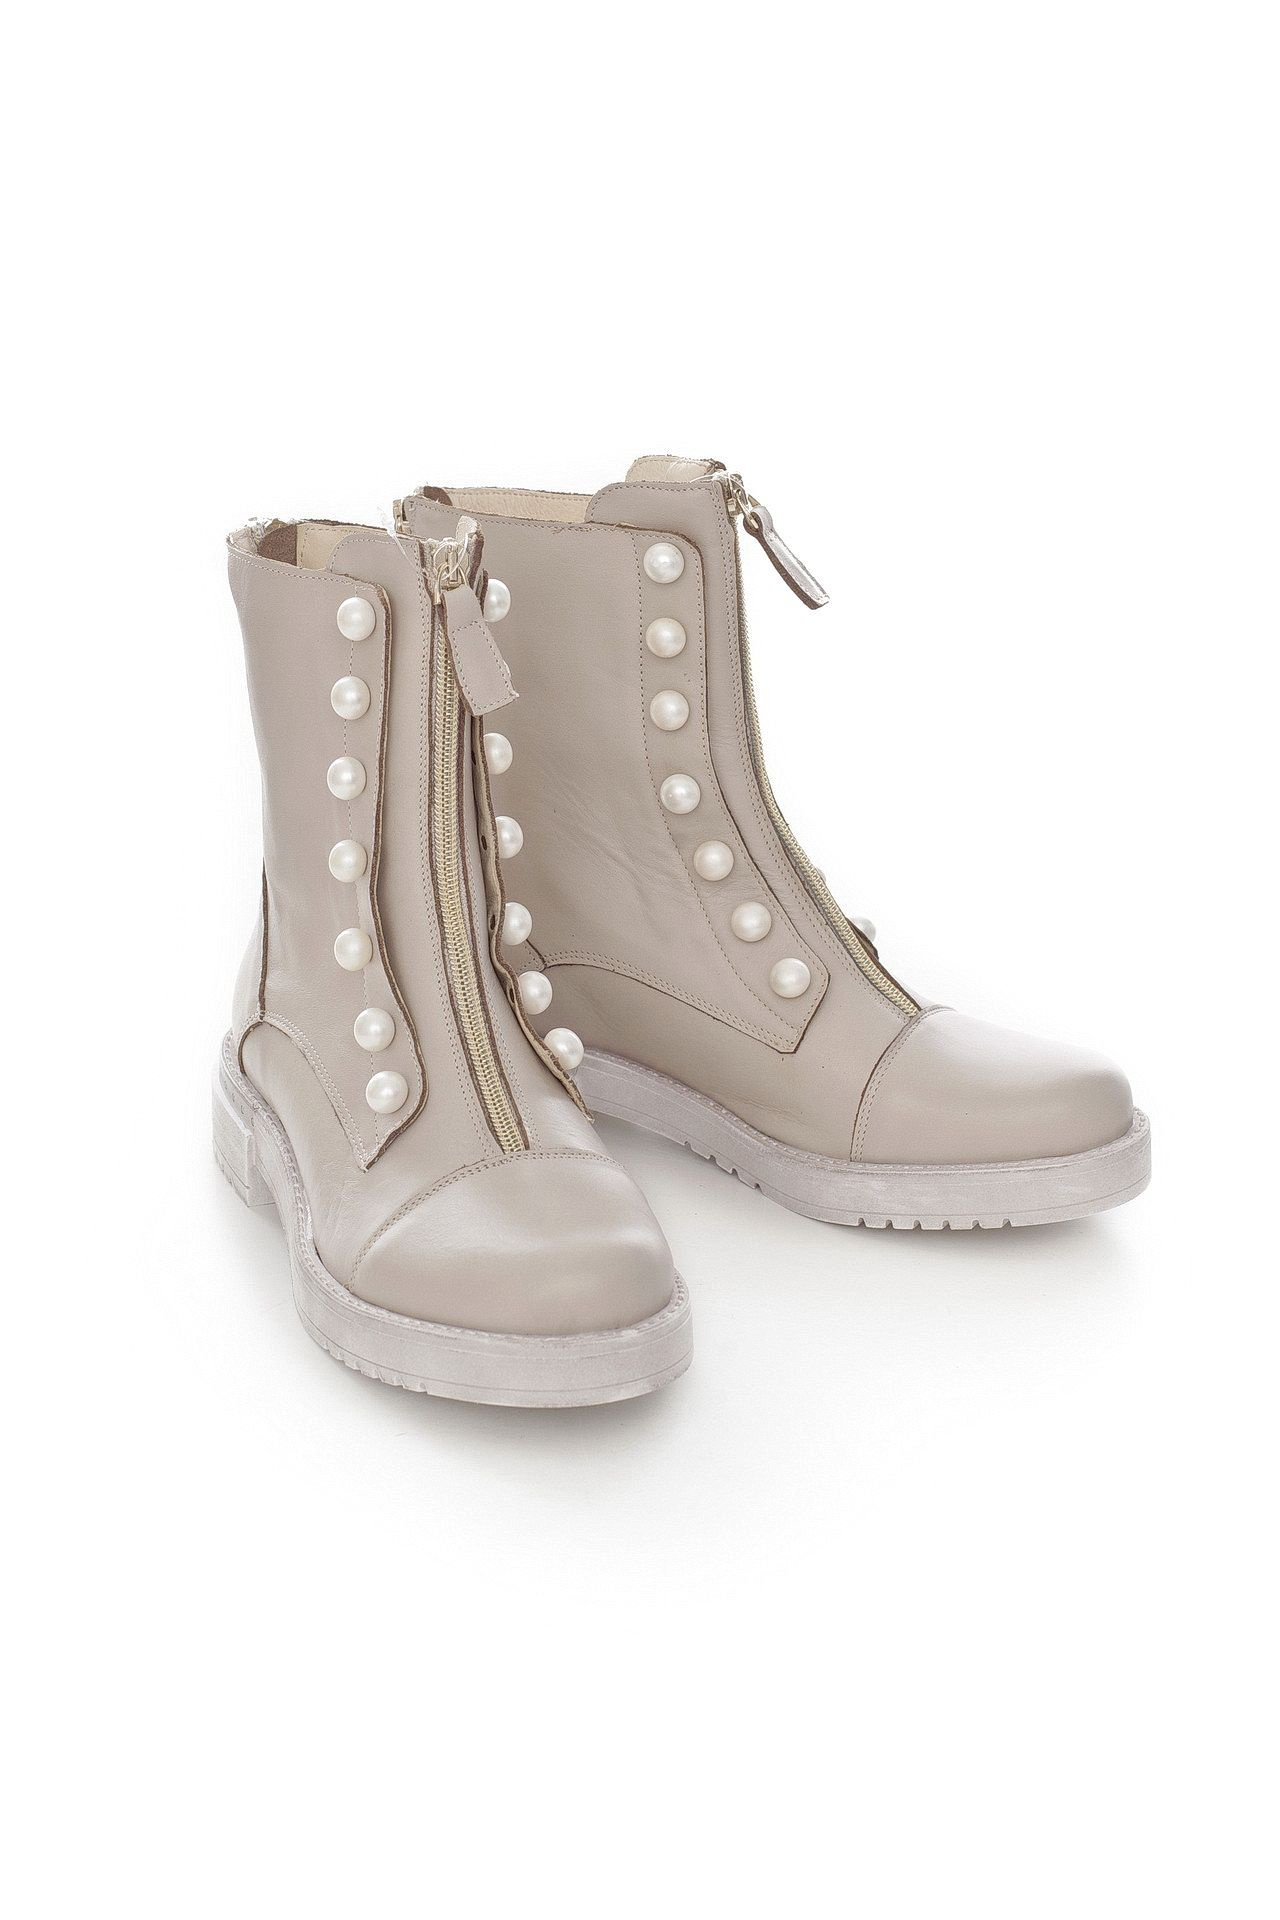 Ботинки LETICIA MILANO by Lestrosa бежевые ботинки на зиму